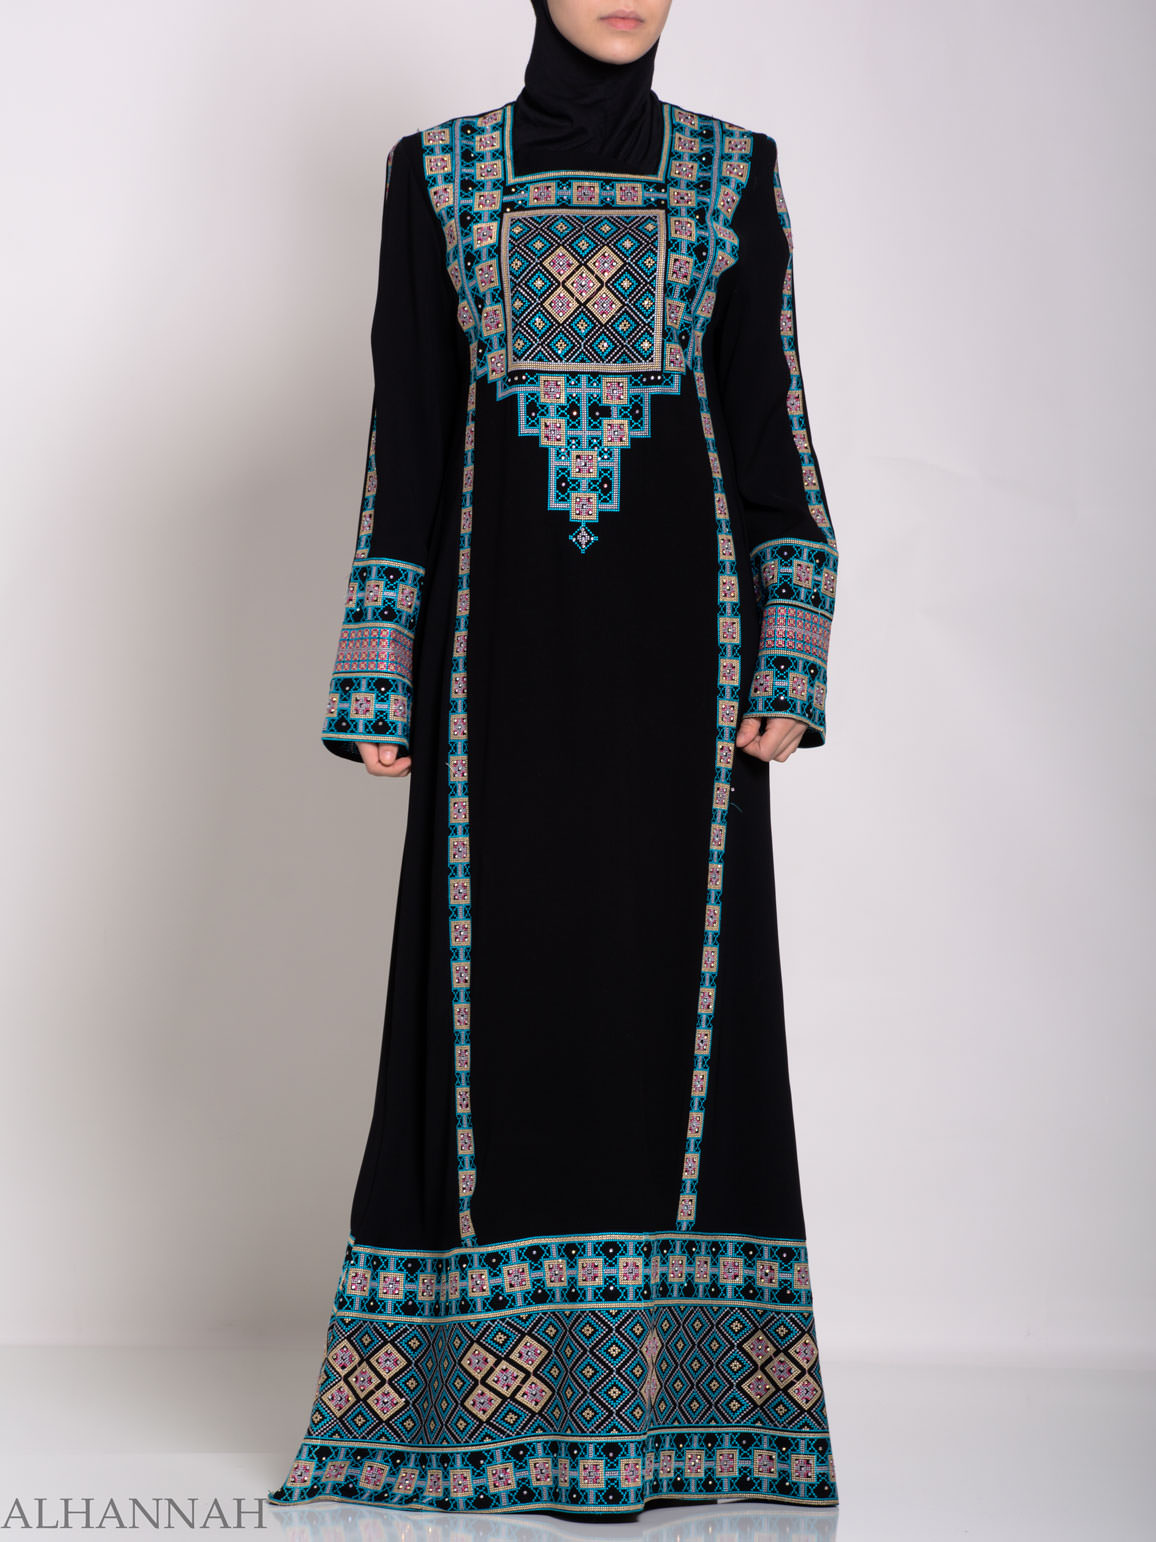 Faizah Embroidered Palestinian Fellaha Thobe th764 (5)